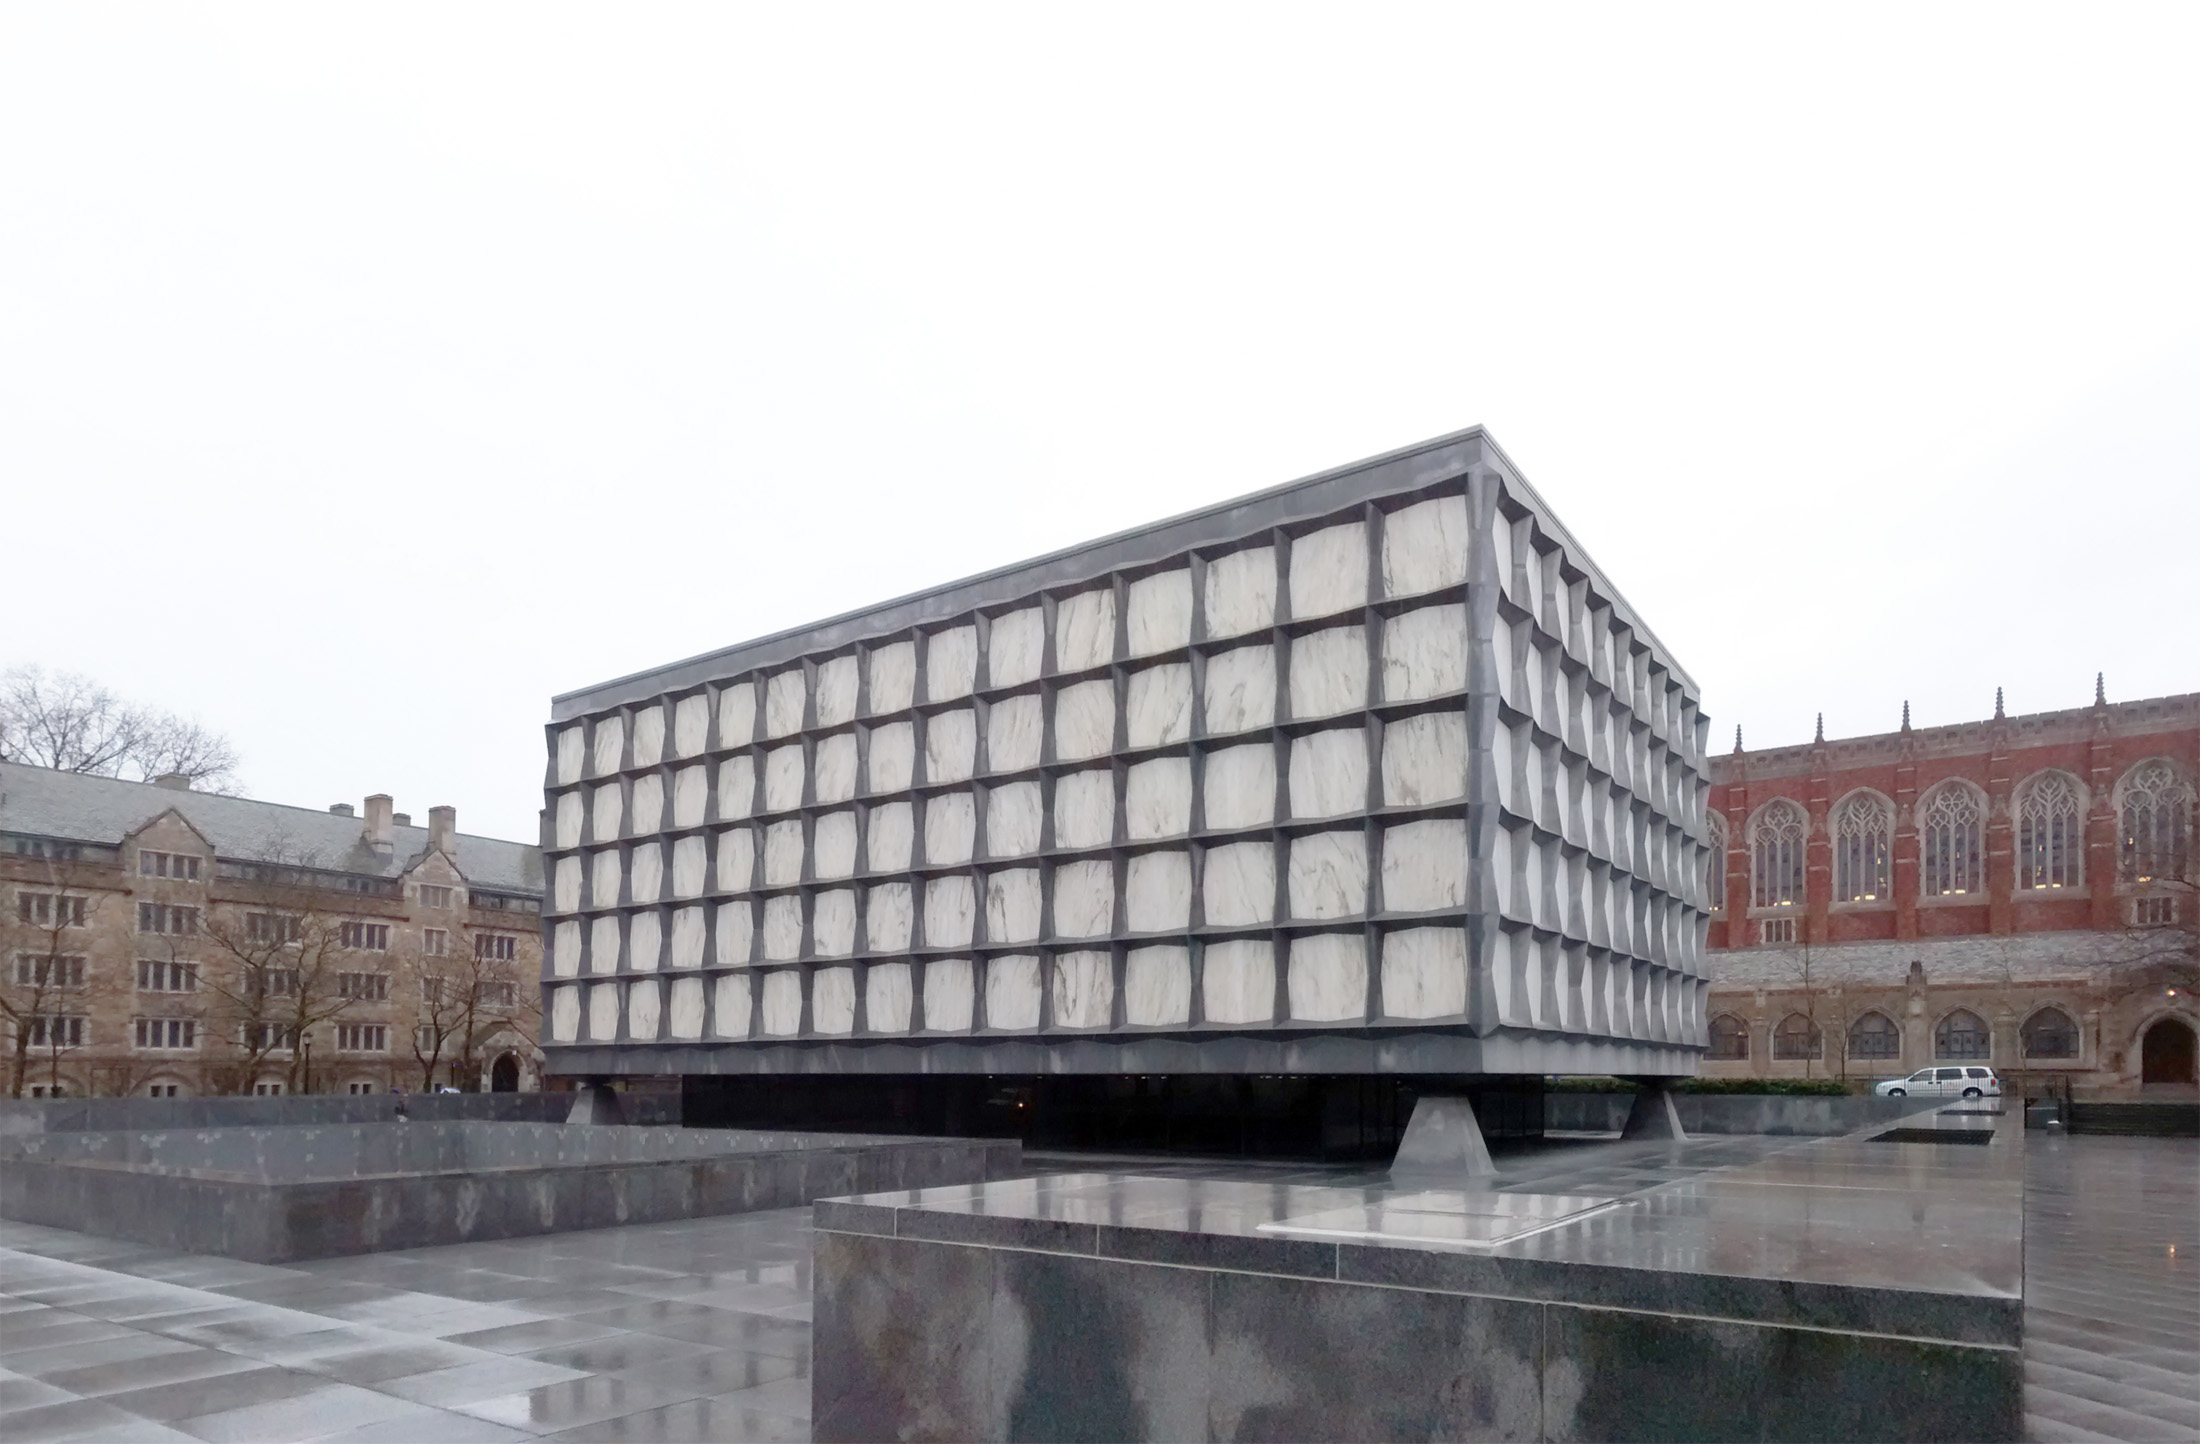 Beinecke Rare Book Manuscript Library Yale University Hewitt Quadrangle New Haven Connecticut Apr 2014